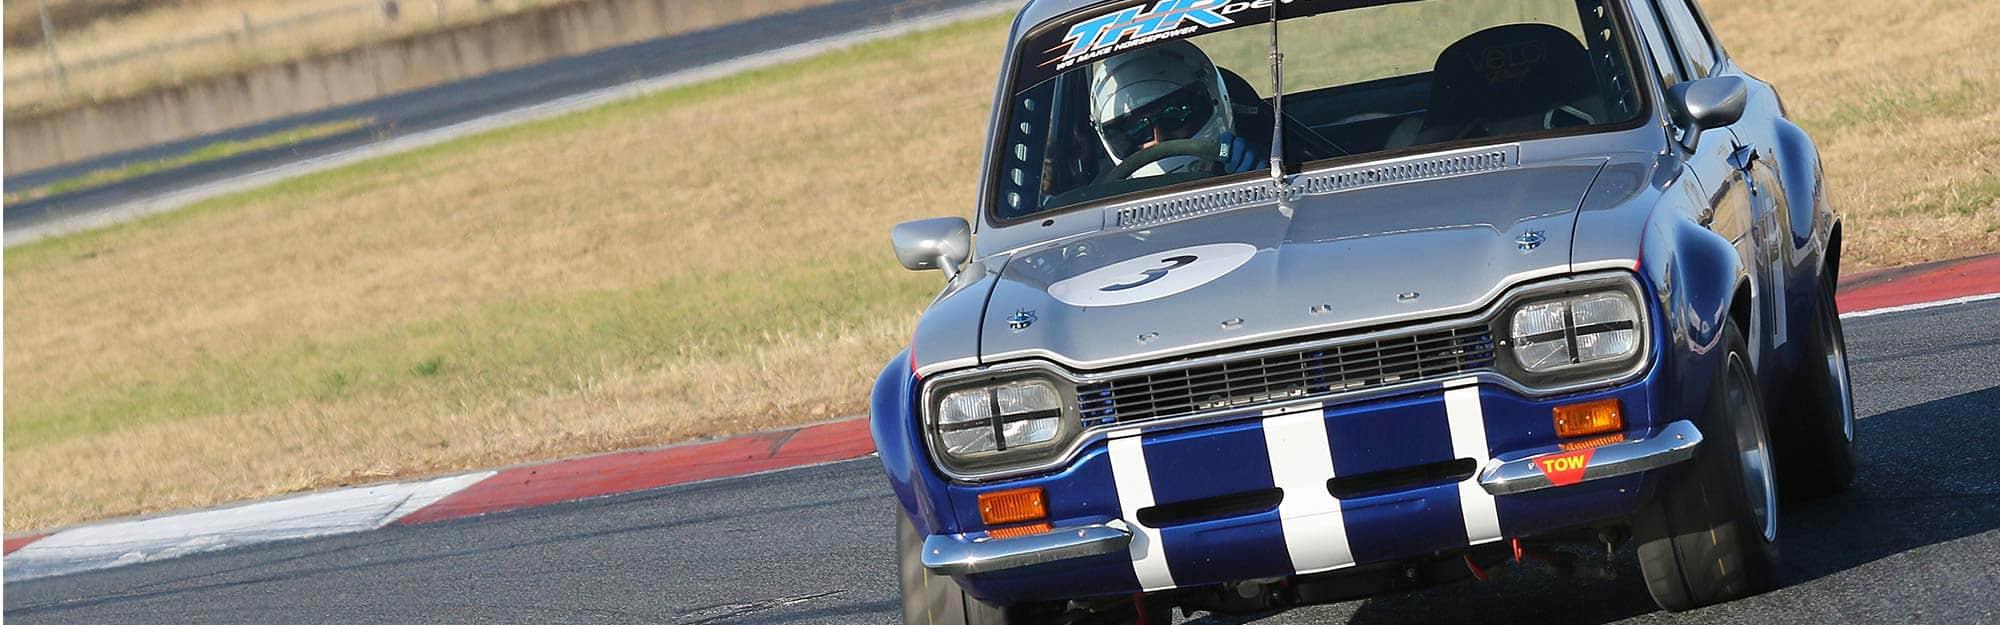 Race tyres